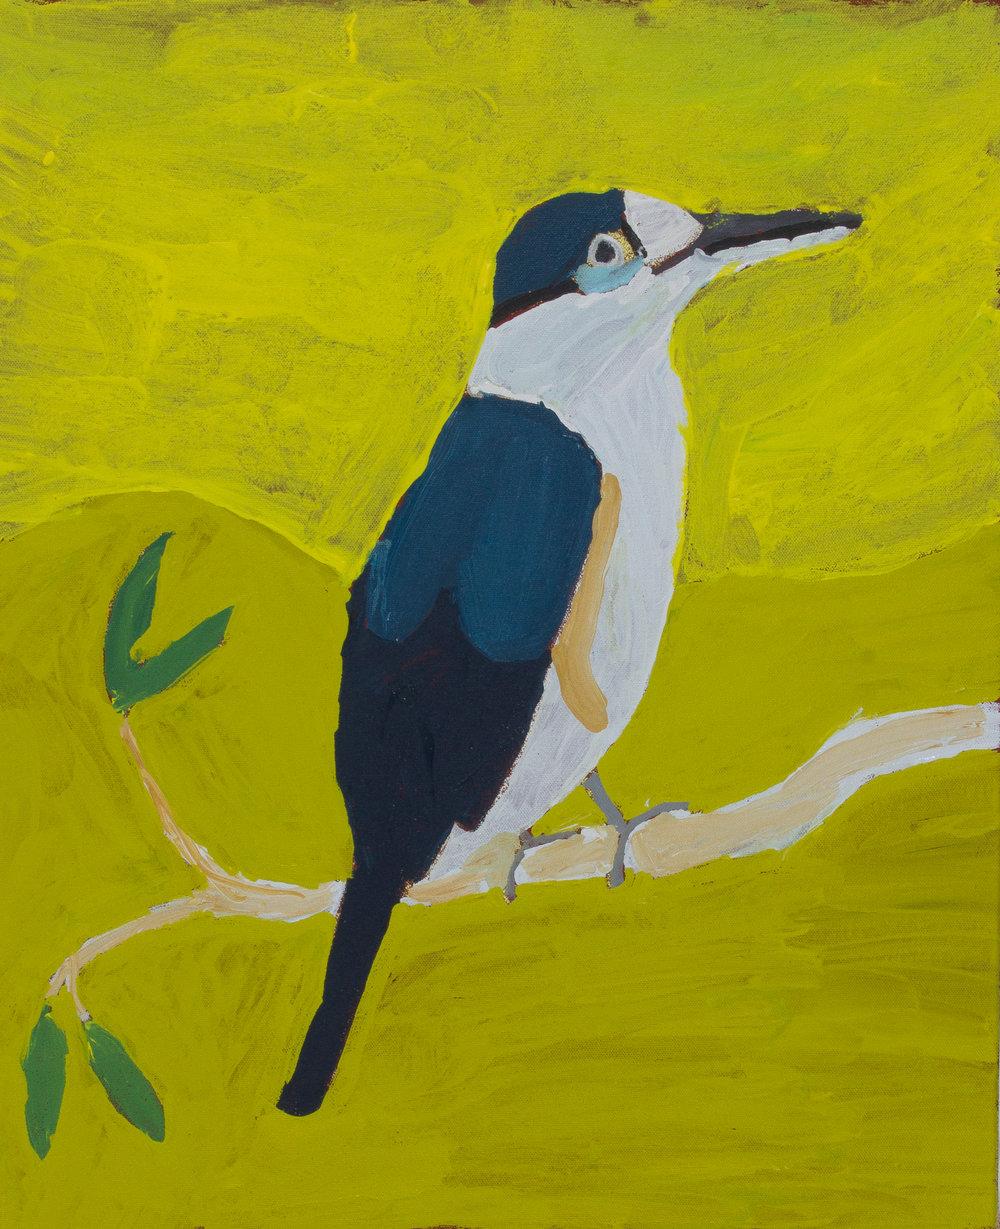 "Nyangulya Katie Nalgood  Kookaburra  22 x 18"" (56 x 45.5 cm) acrylic on linen Spinifex Hills Artists Catalog #18-469   EMAIL INQUIRY"